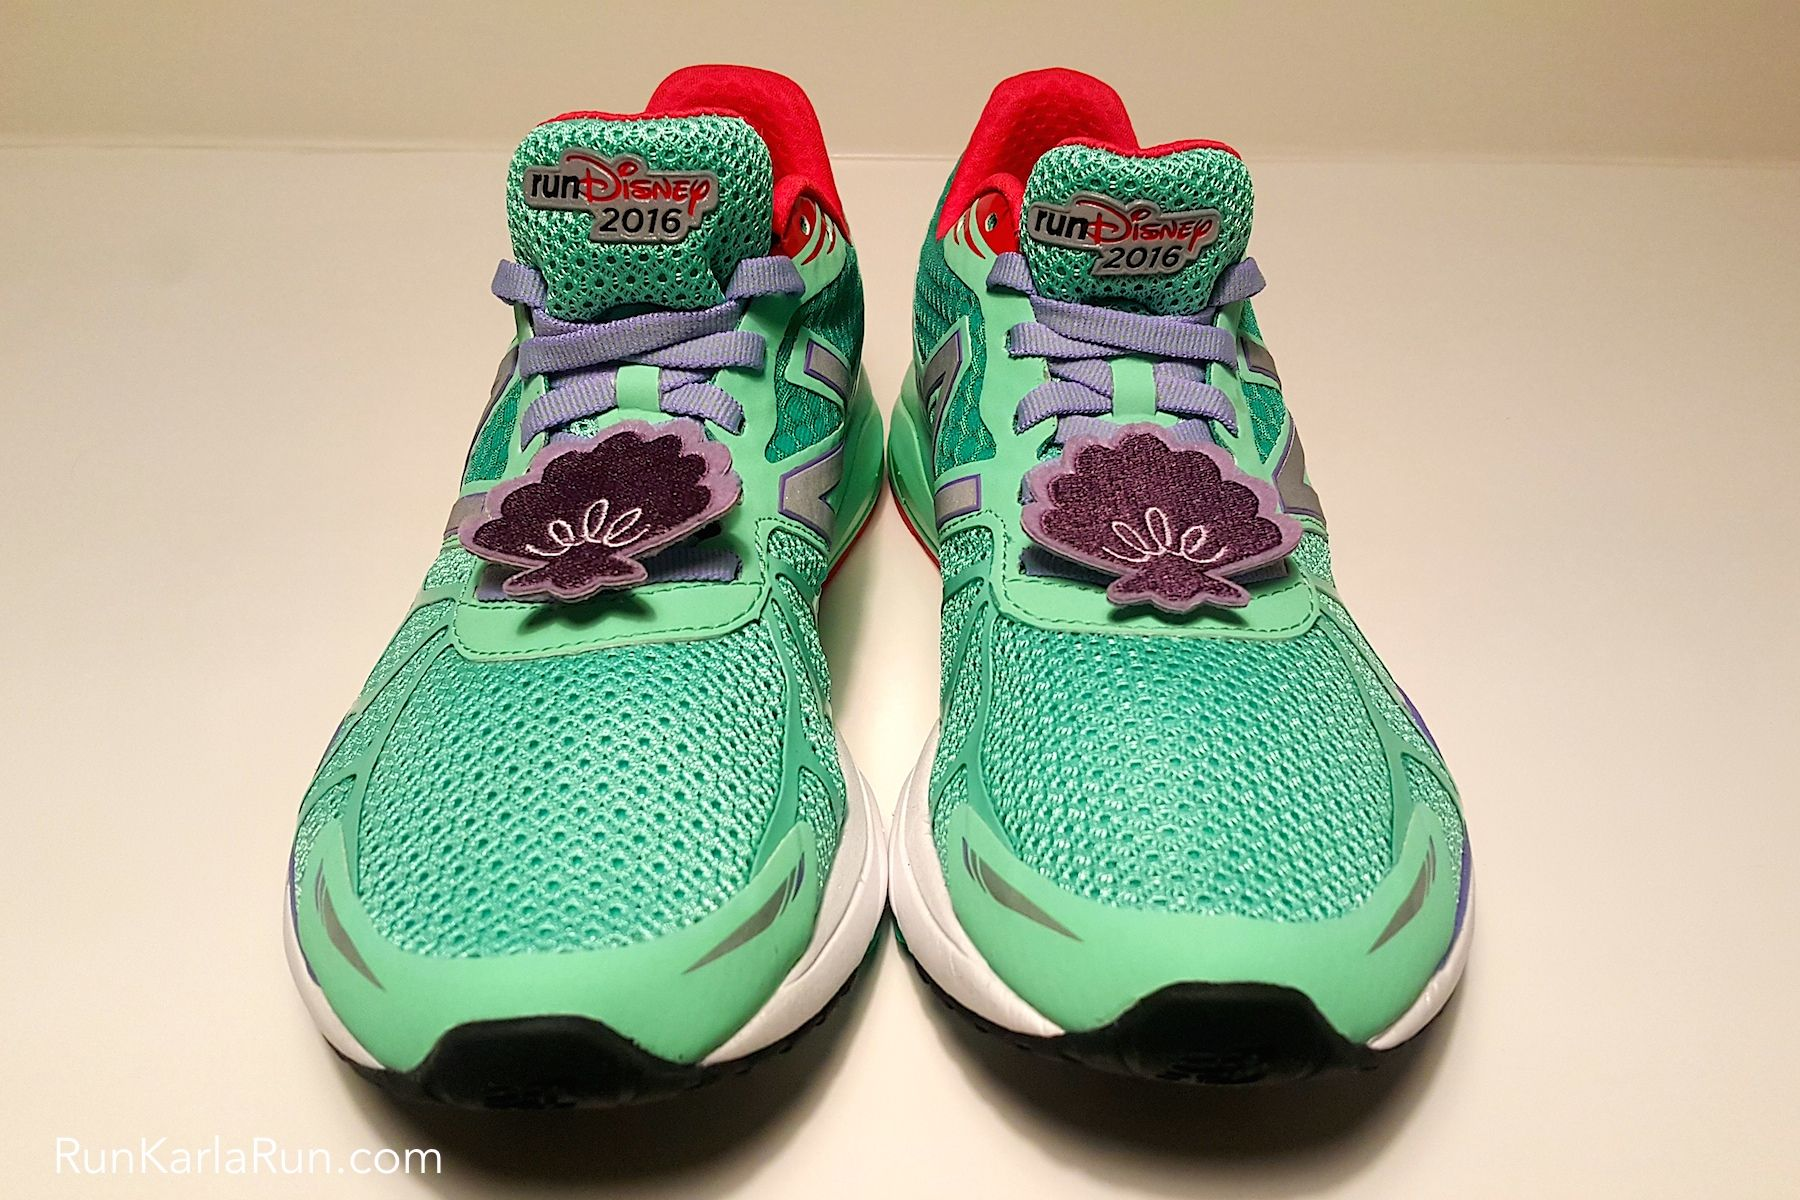 New Balance Ariel runDisney Shoes First Look | Ariel | Run